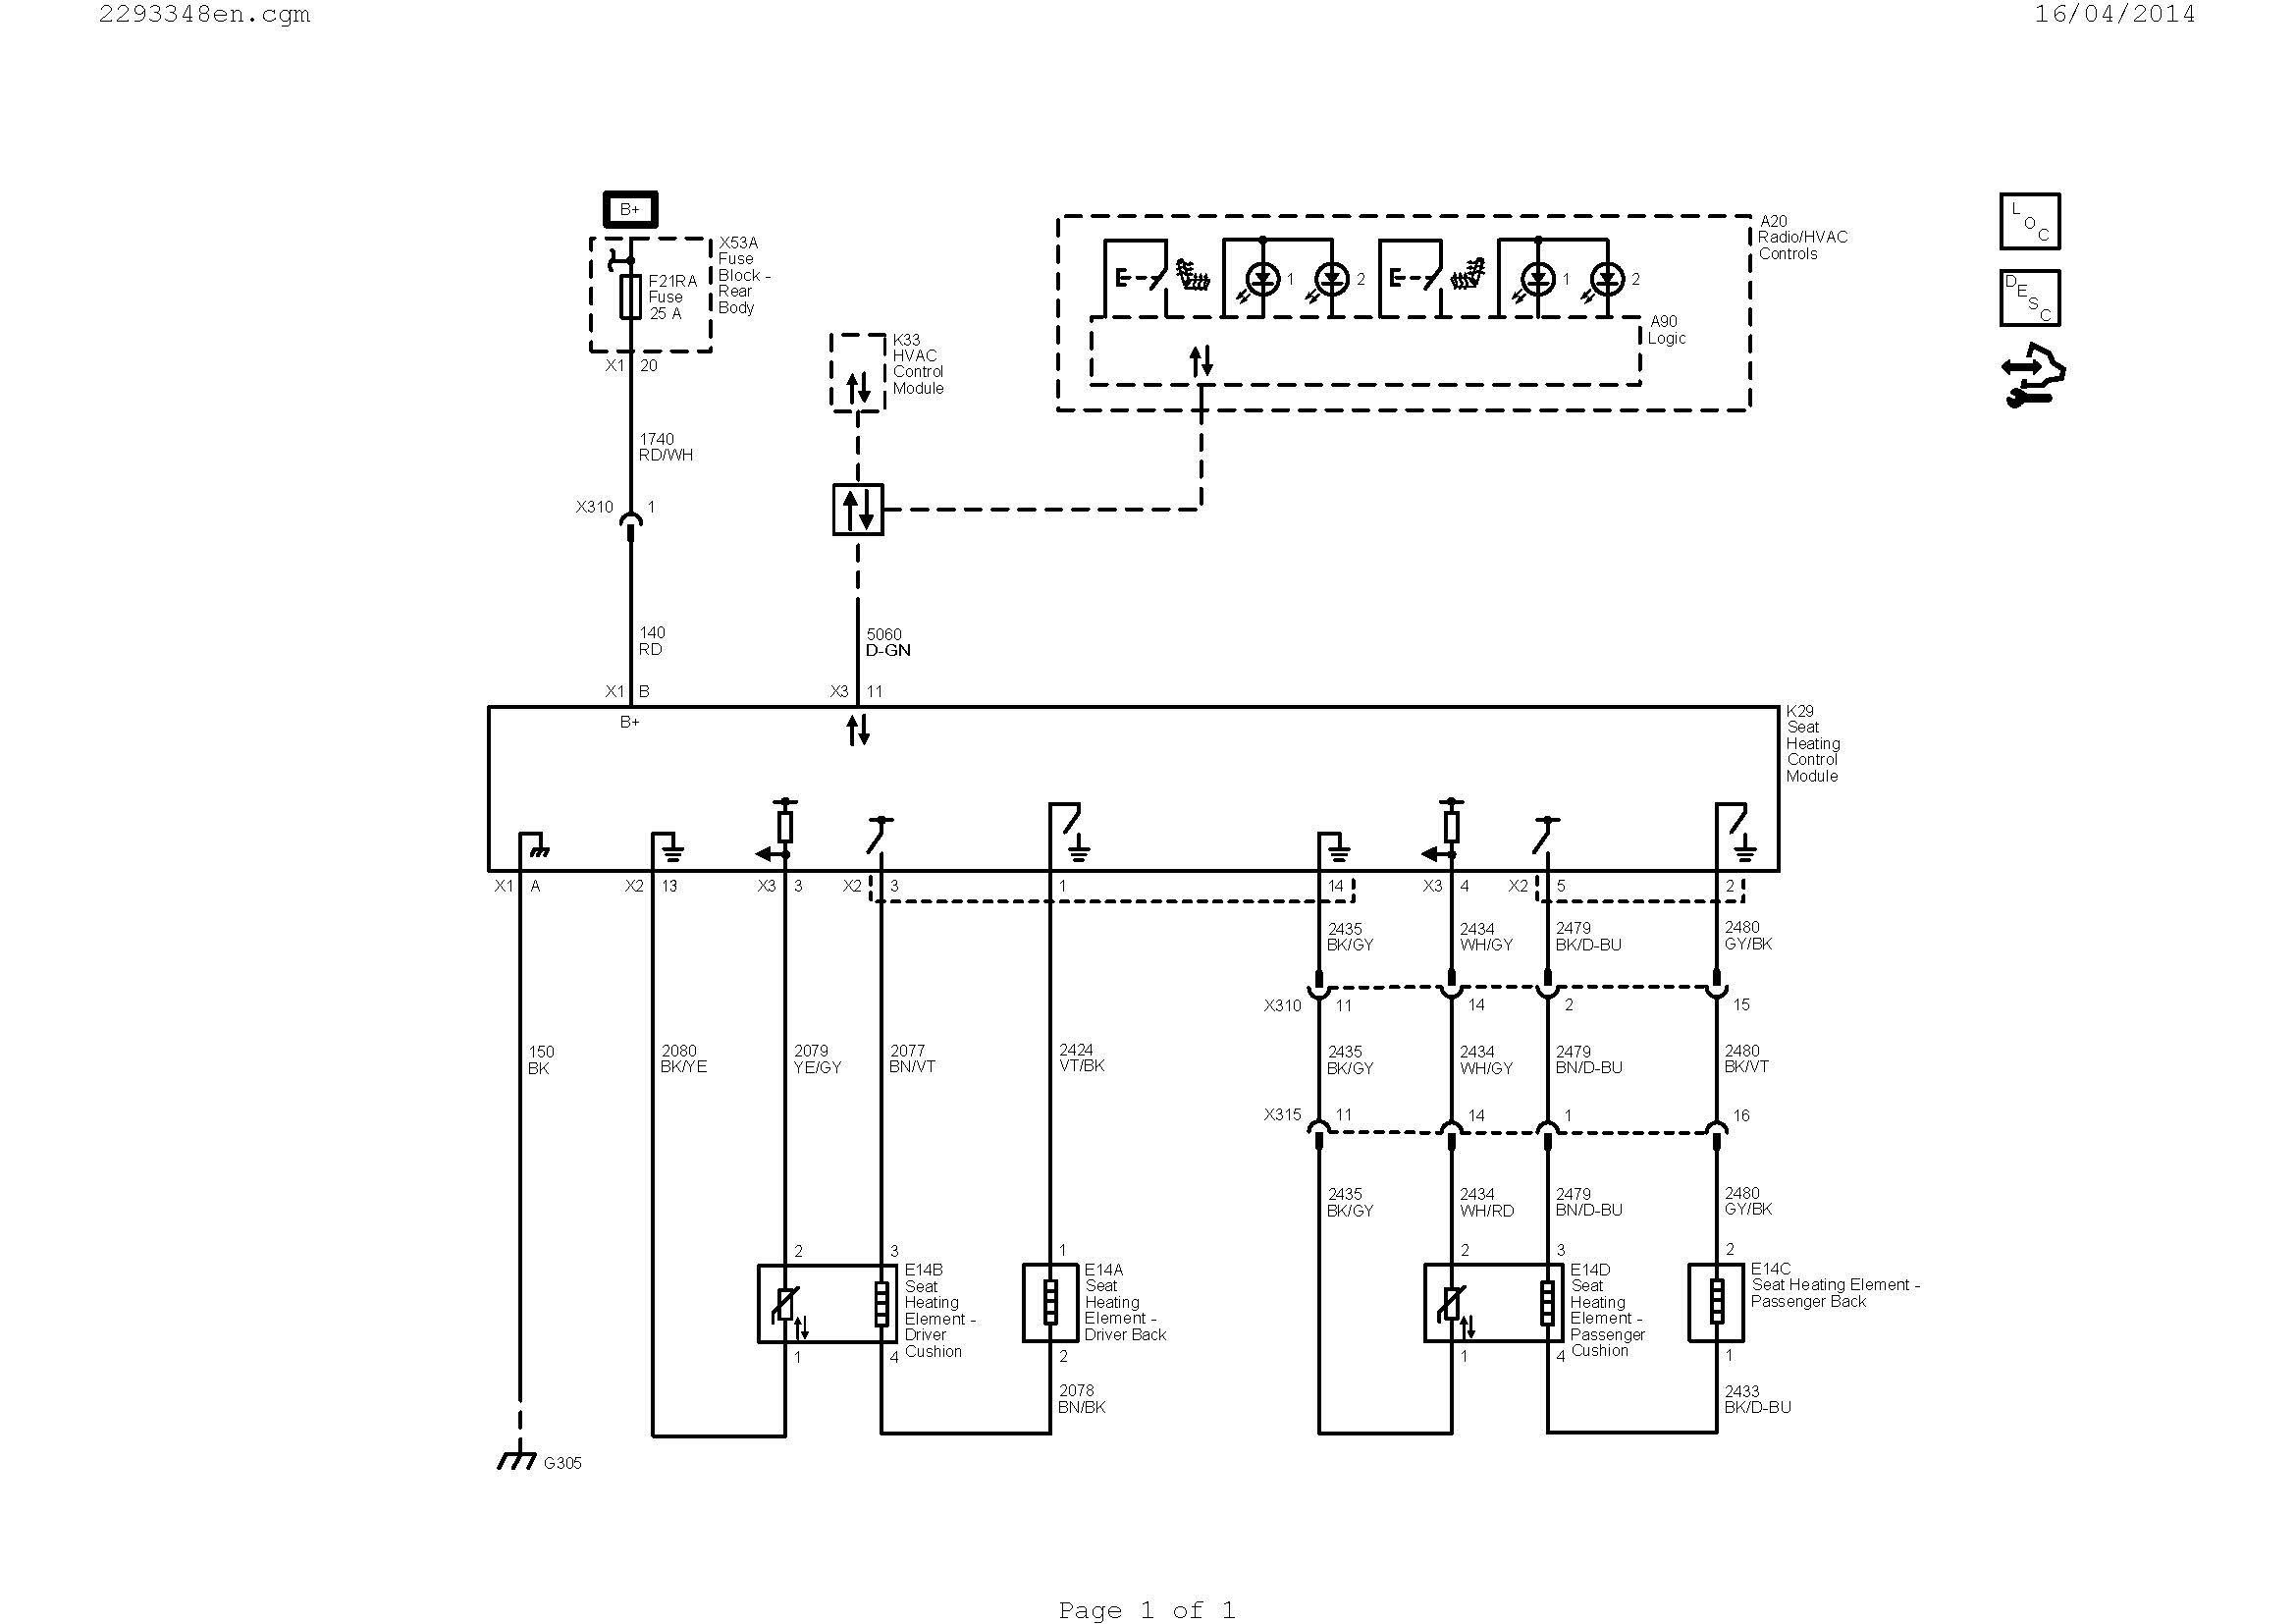 2007 toyota Tundra Wiring Diagram | Free Wiring Diagram on 07 toyota tundra wiring diagram, ez-go wiring harness diagram, 1989 toyota corolla wiring diagram, 2010 toyota camry wiring diagram, 2001 toyota sequoia wiring diagram, 1997 toyota t100 wiring diagram, 2000 toyota rav4 wiring diagram, 1997 toyota celica wiring diagram, 2007 gmc sierra 2500hd wiring diagram, 2003 toyota tundra wiring diagram, toyota tundra radio wiring diagram, 2007 chevrolet colorado wiring diagram, toyota wiring harness diagram, 2007 honda element wiring diagram, 2001 toyota avalon wiring diagram, 2002 toyota corolla wiring diagram, 2004 toyota highlander wiring diagram, 2007 kia rio wiring diagram, 2009 toyota venza wiring diagram, 2007 pontiac grand prix wiring diagram,